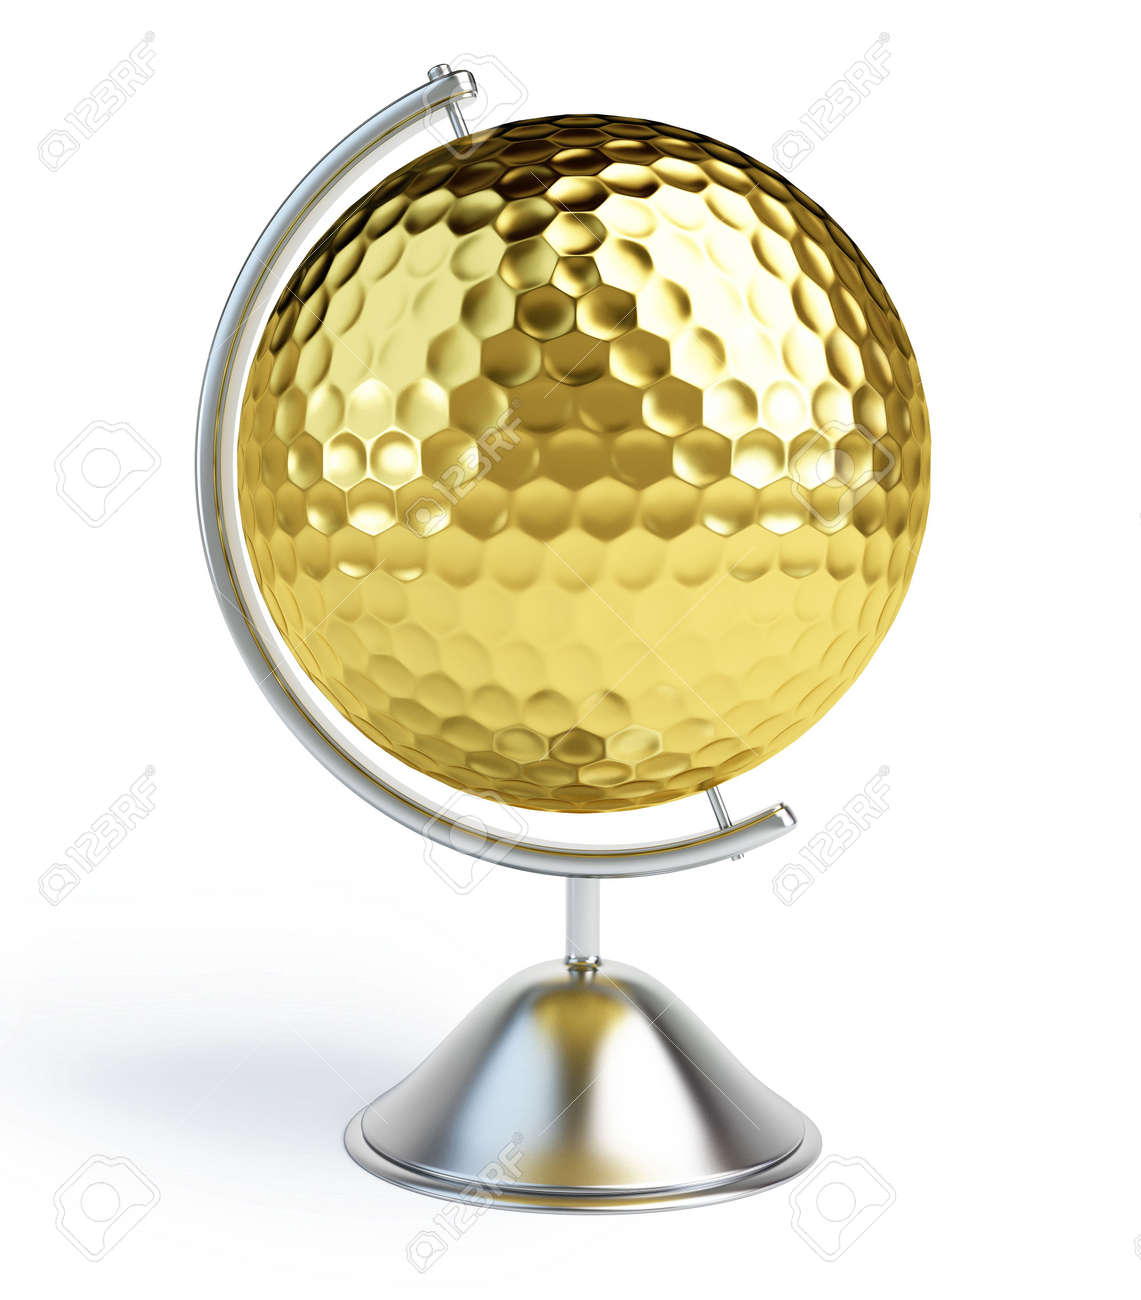 globe golf ball sign Stock Photo - 7042287